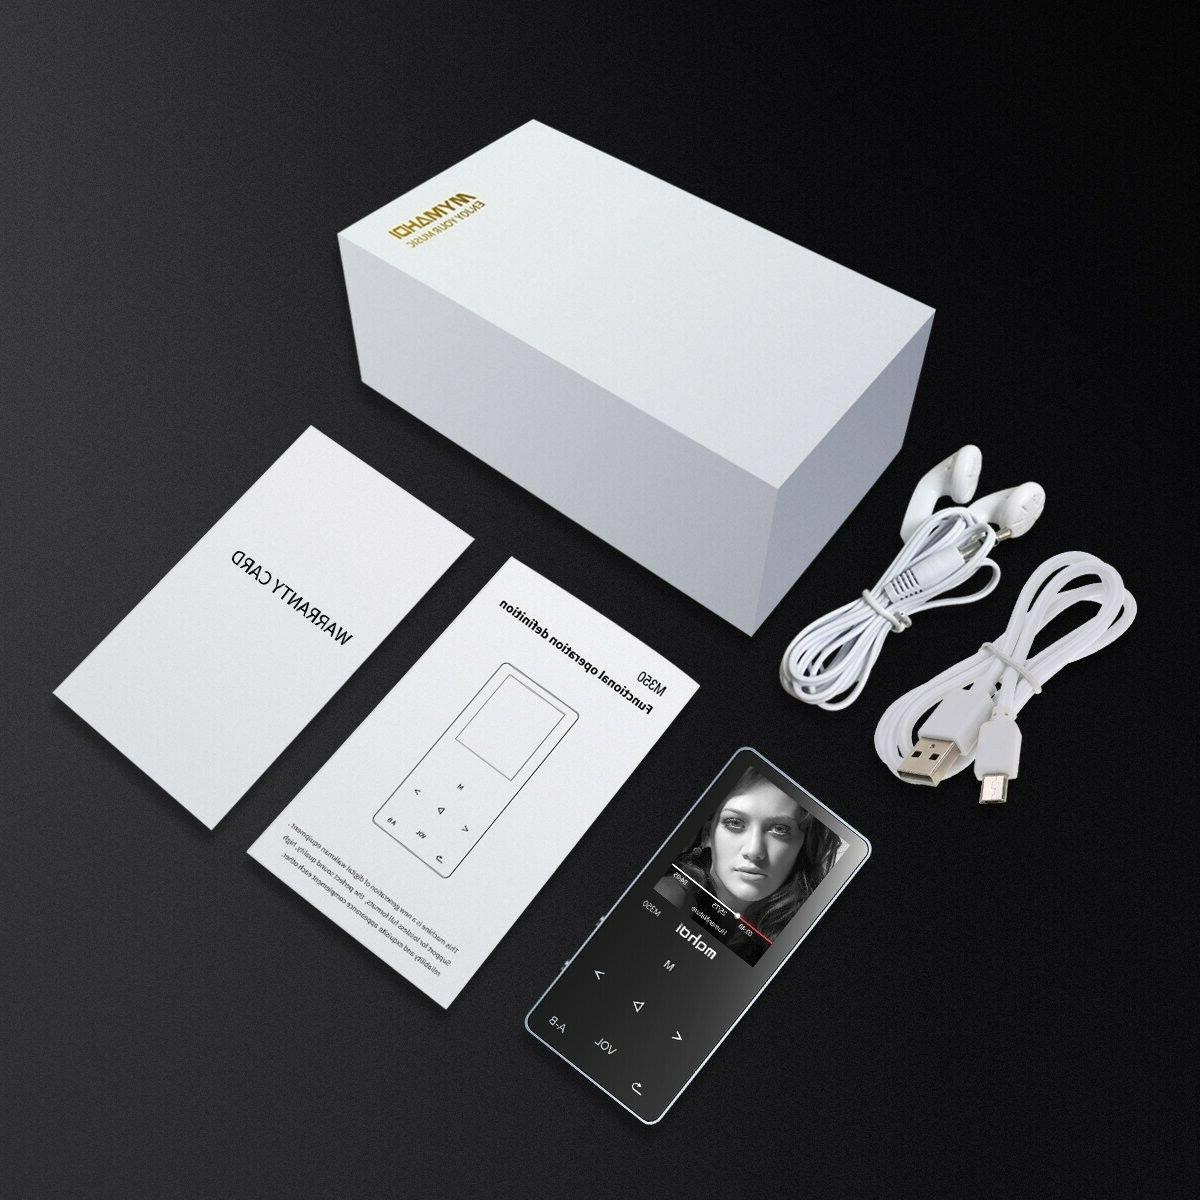 MYMAHDI MP3/MP4 Music 8GB Body, Up to